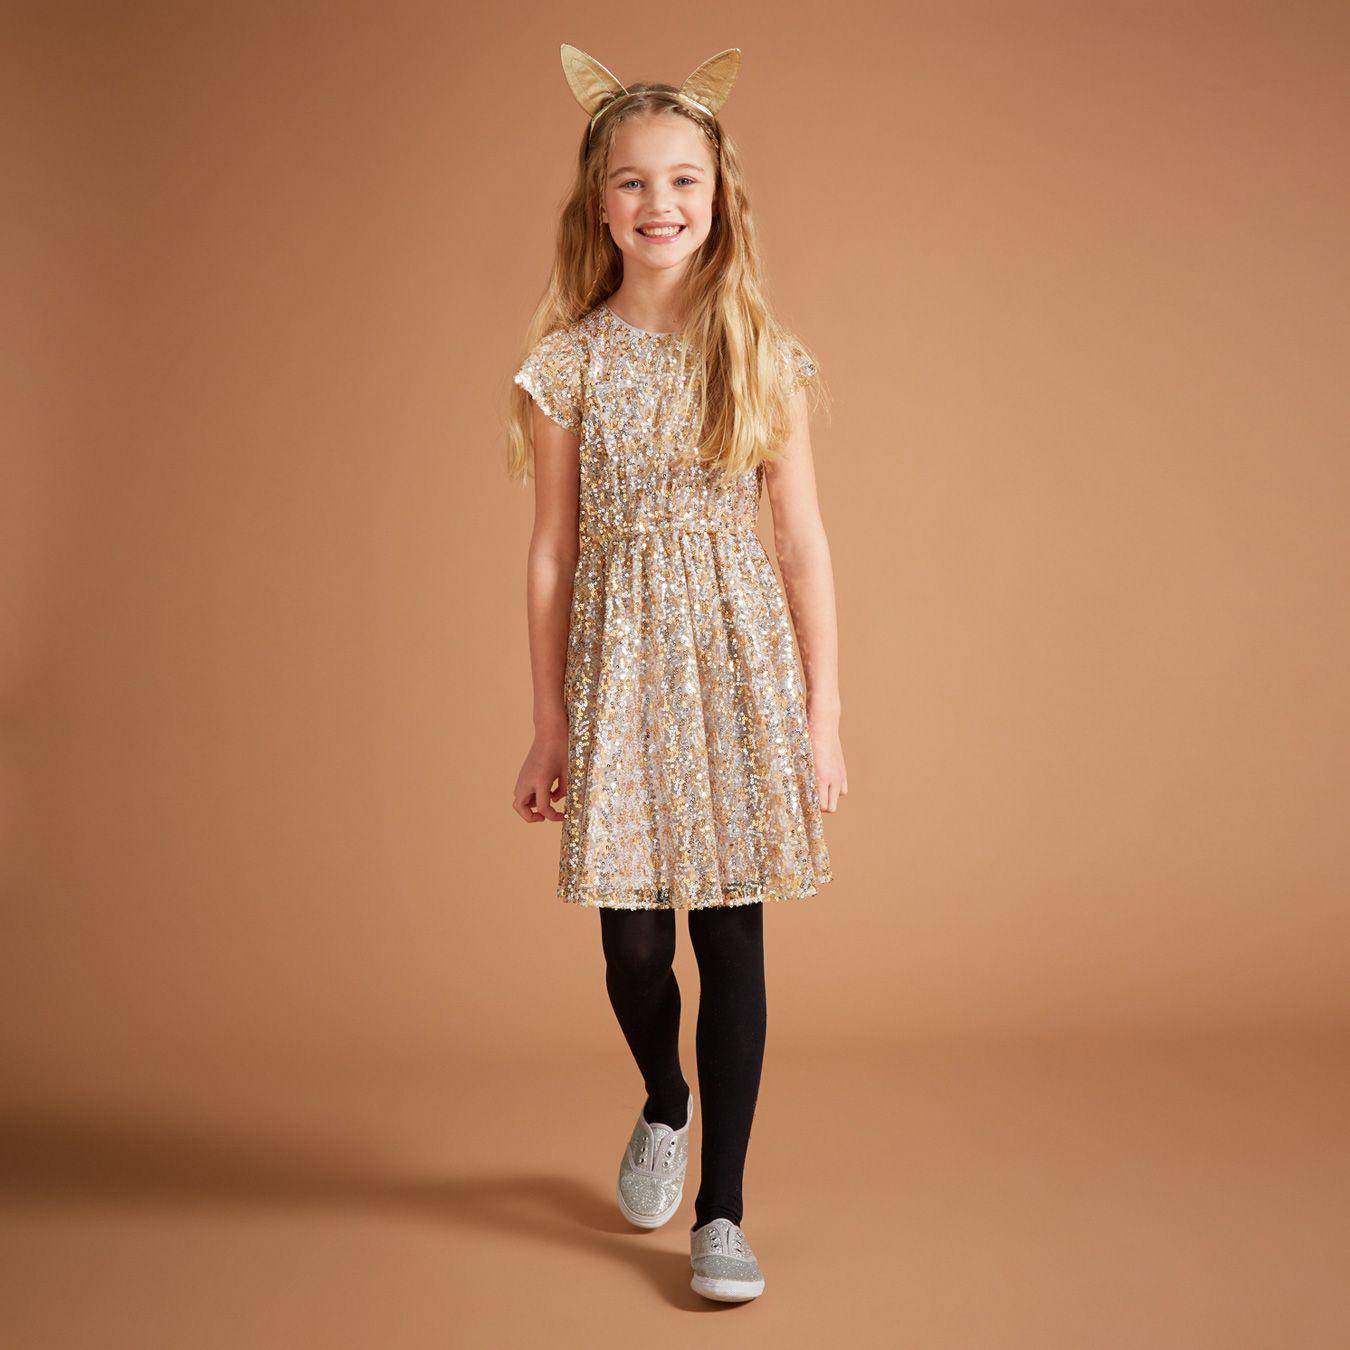 ilovegorgeous - Wonder Dress #christmas #gifts #feelingfestive ...